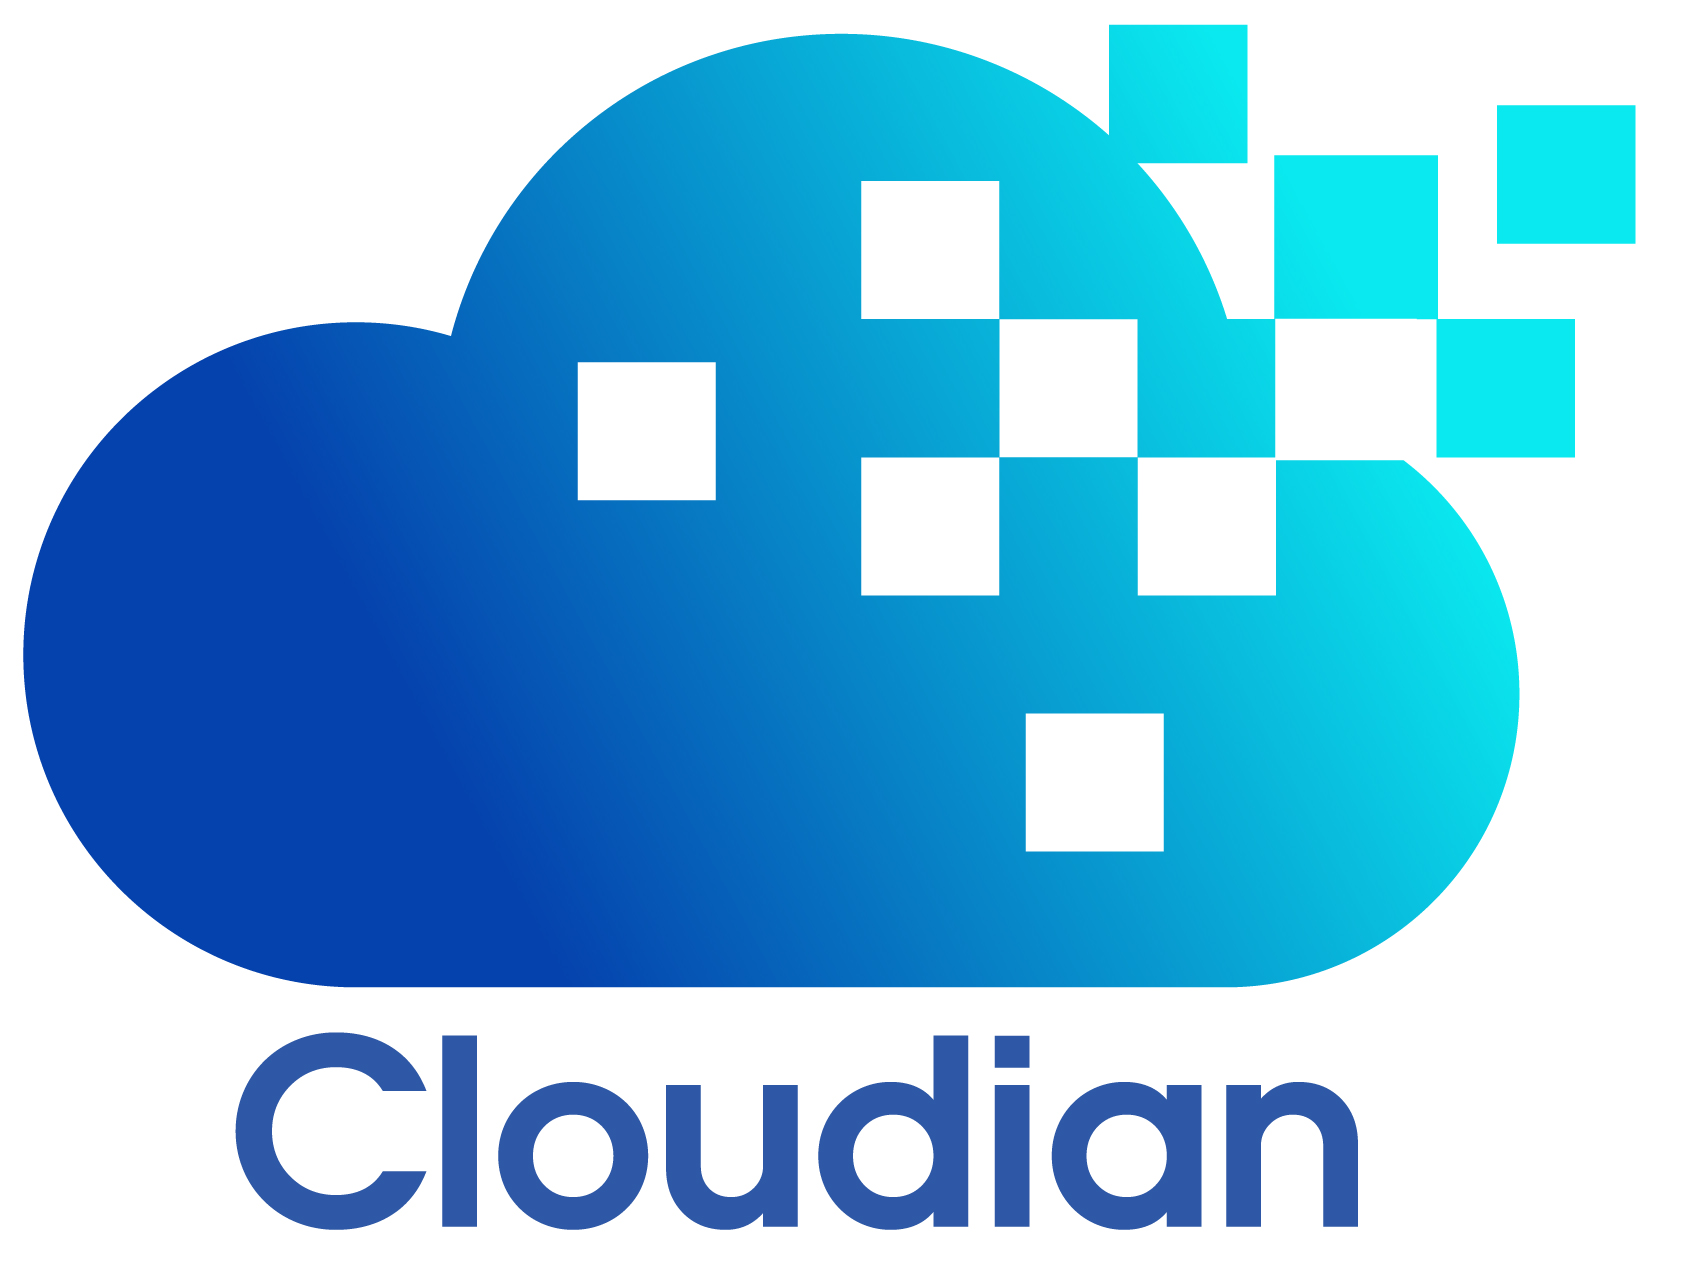 Cloudian International (Hong Kong) Limited